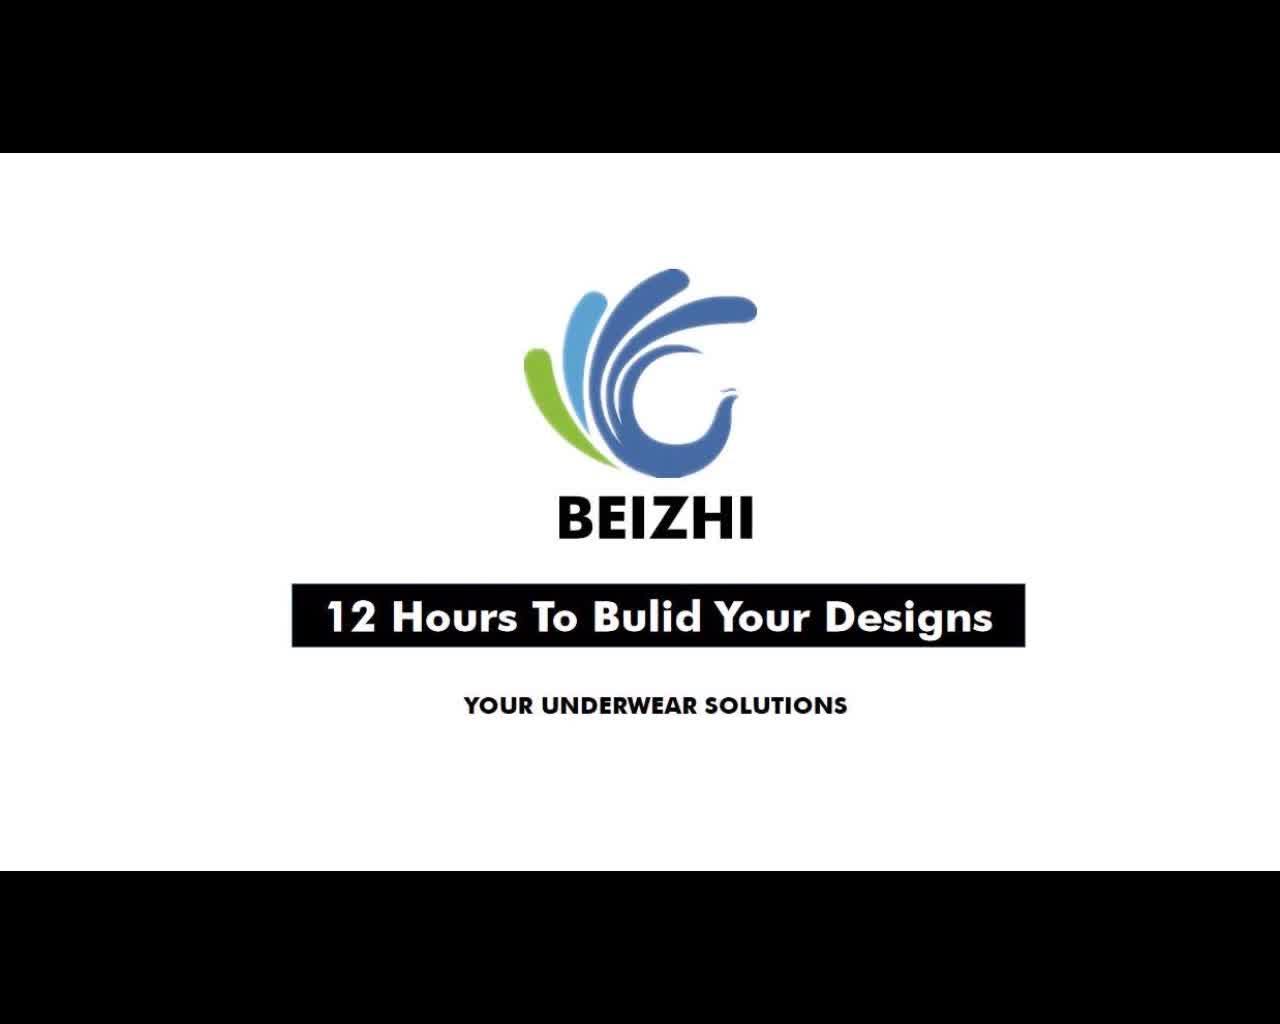 BEIZHI 12 ชั่วโมงการออกแบบที่กำหนดเองเรืองแสงสีชมพู mature สตรีต่ำเอวกางเกงเซ็กซี่